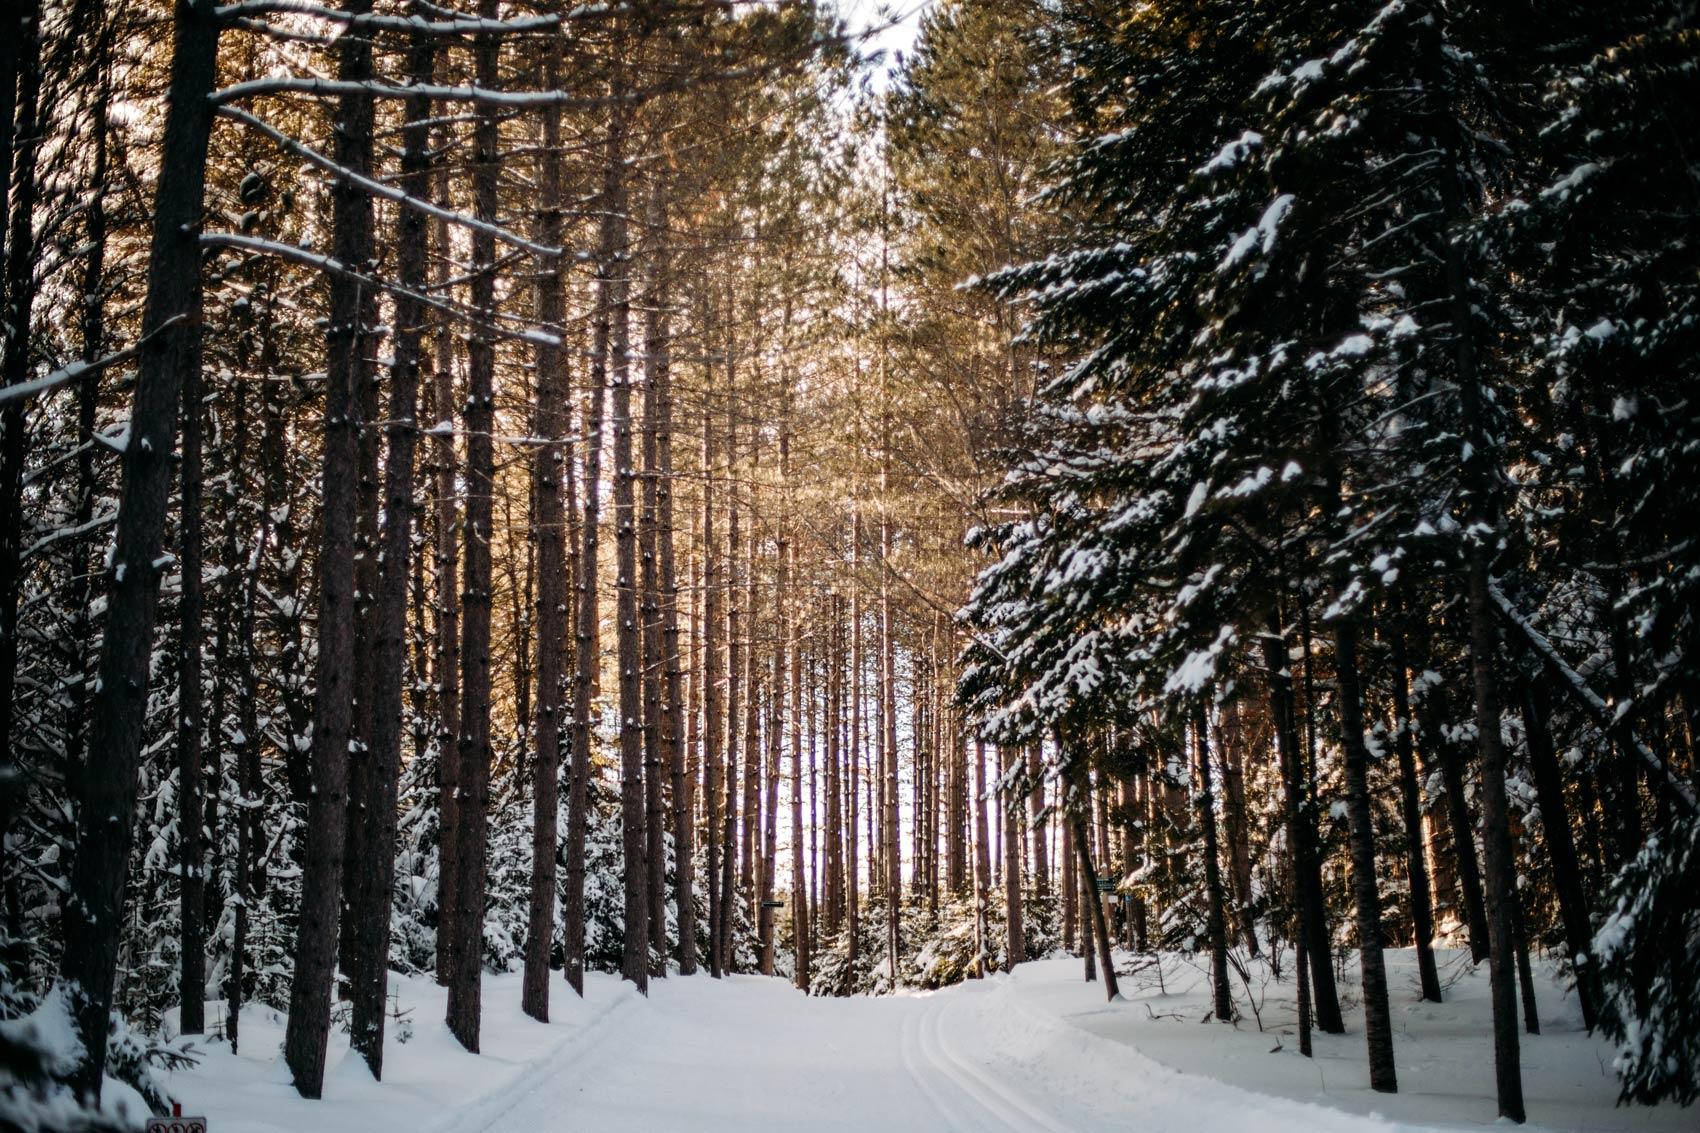 sentier ski de fond domaine Saint-Bernard